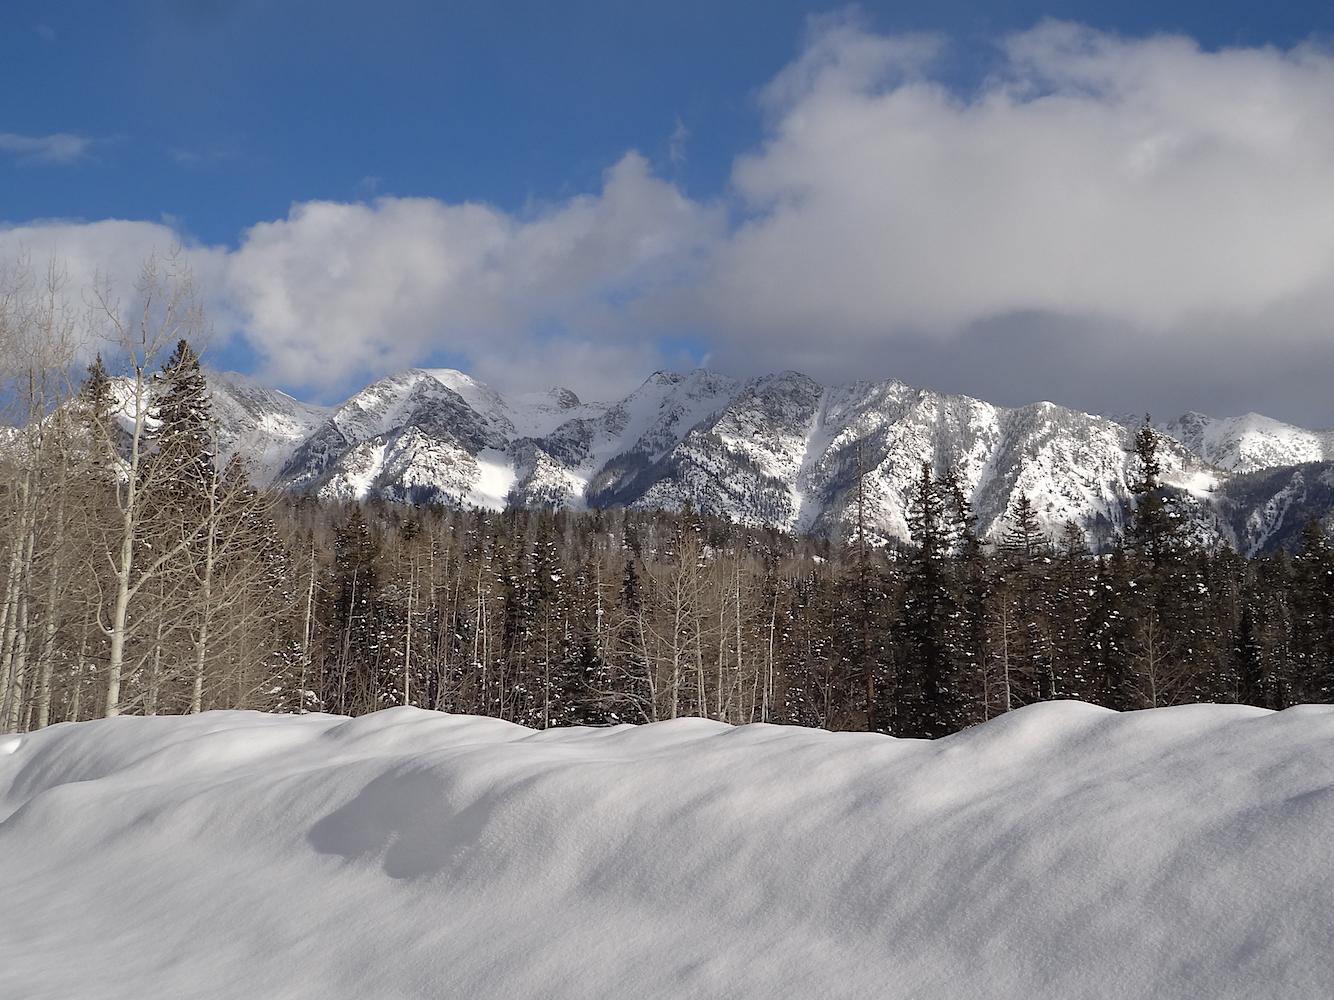 Lime Creek Road Snowshoe, Image #5429